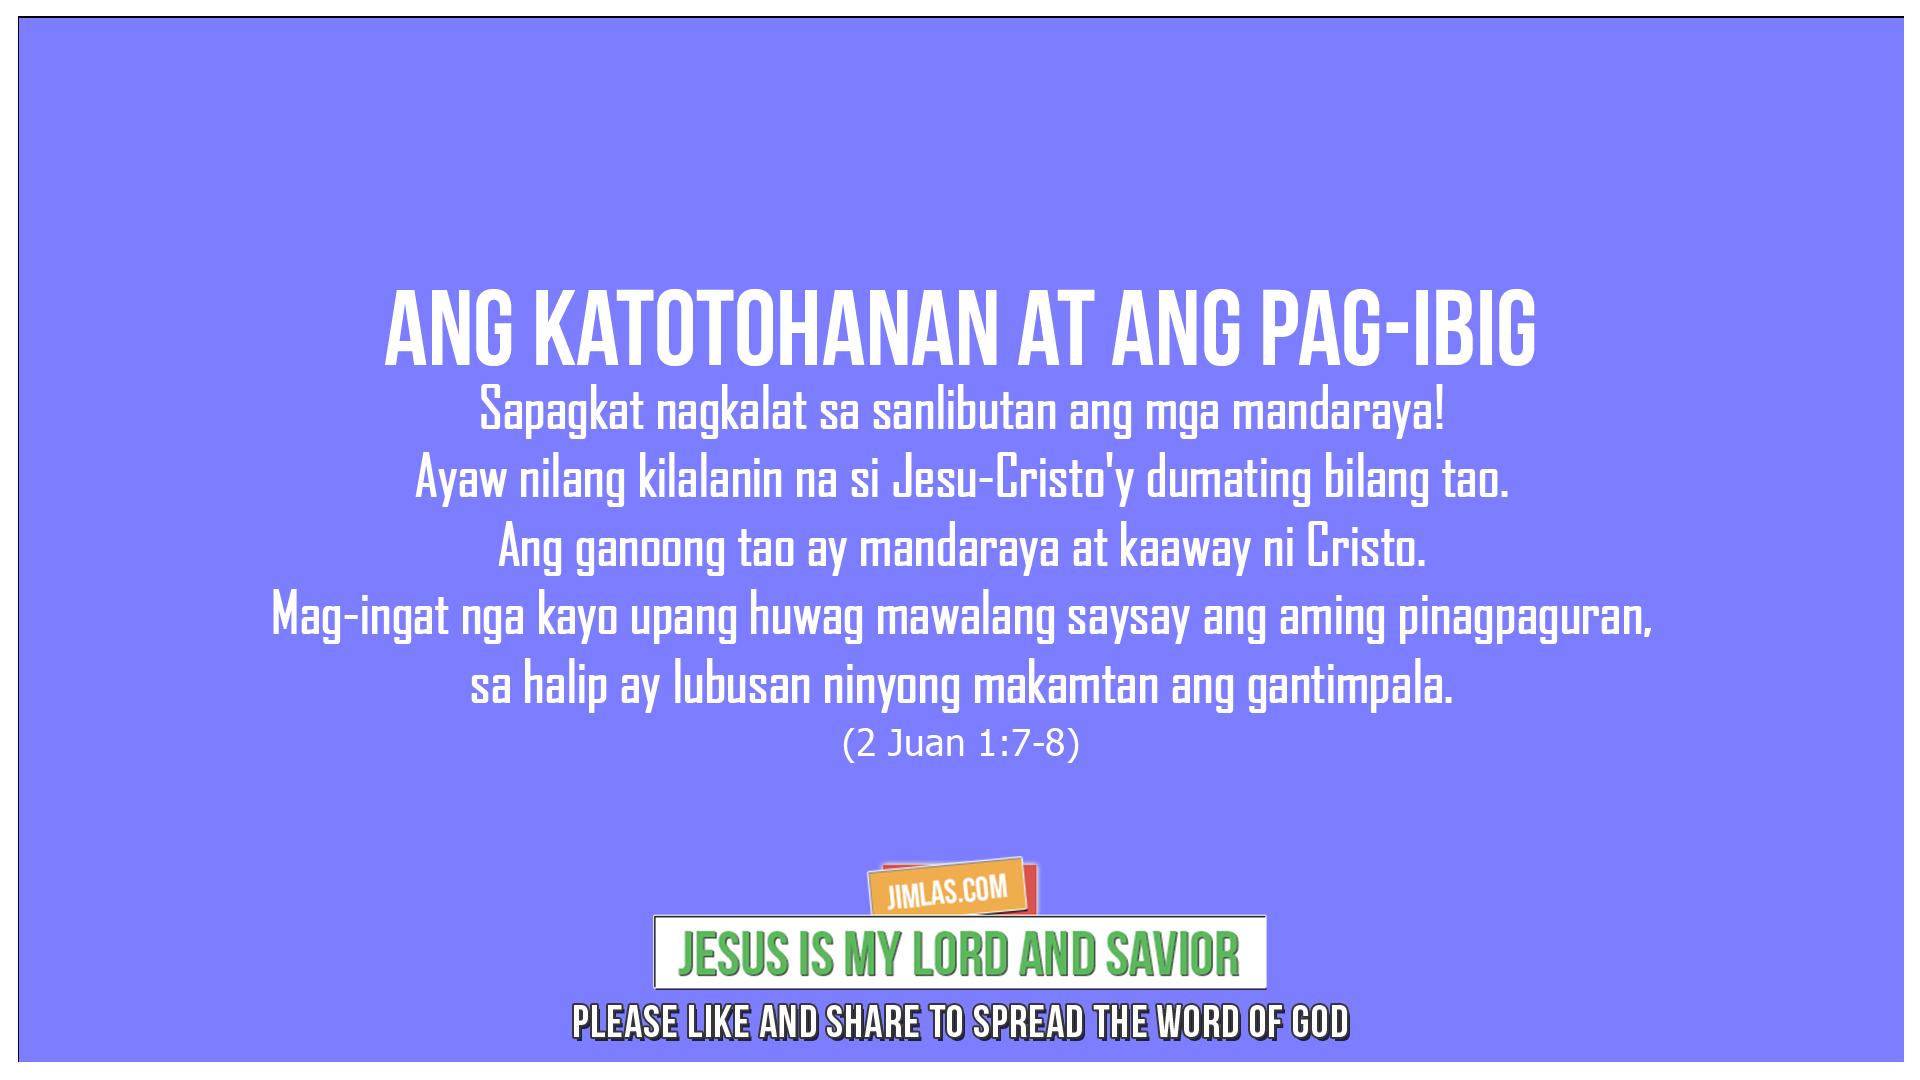 2 Juan 1:7-8, 2 Juan 1:7-8